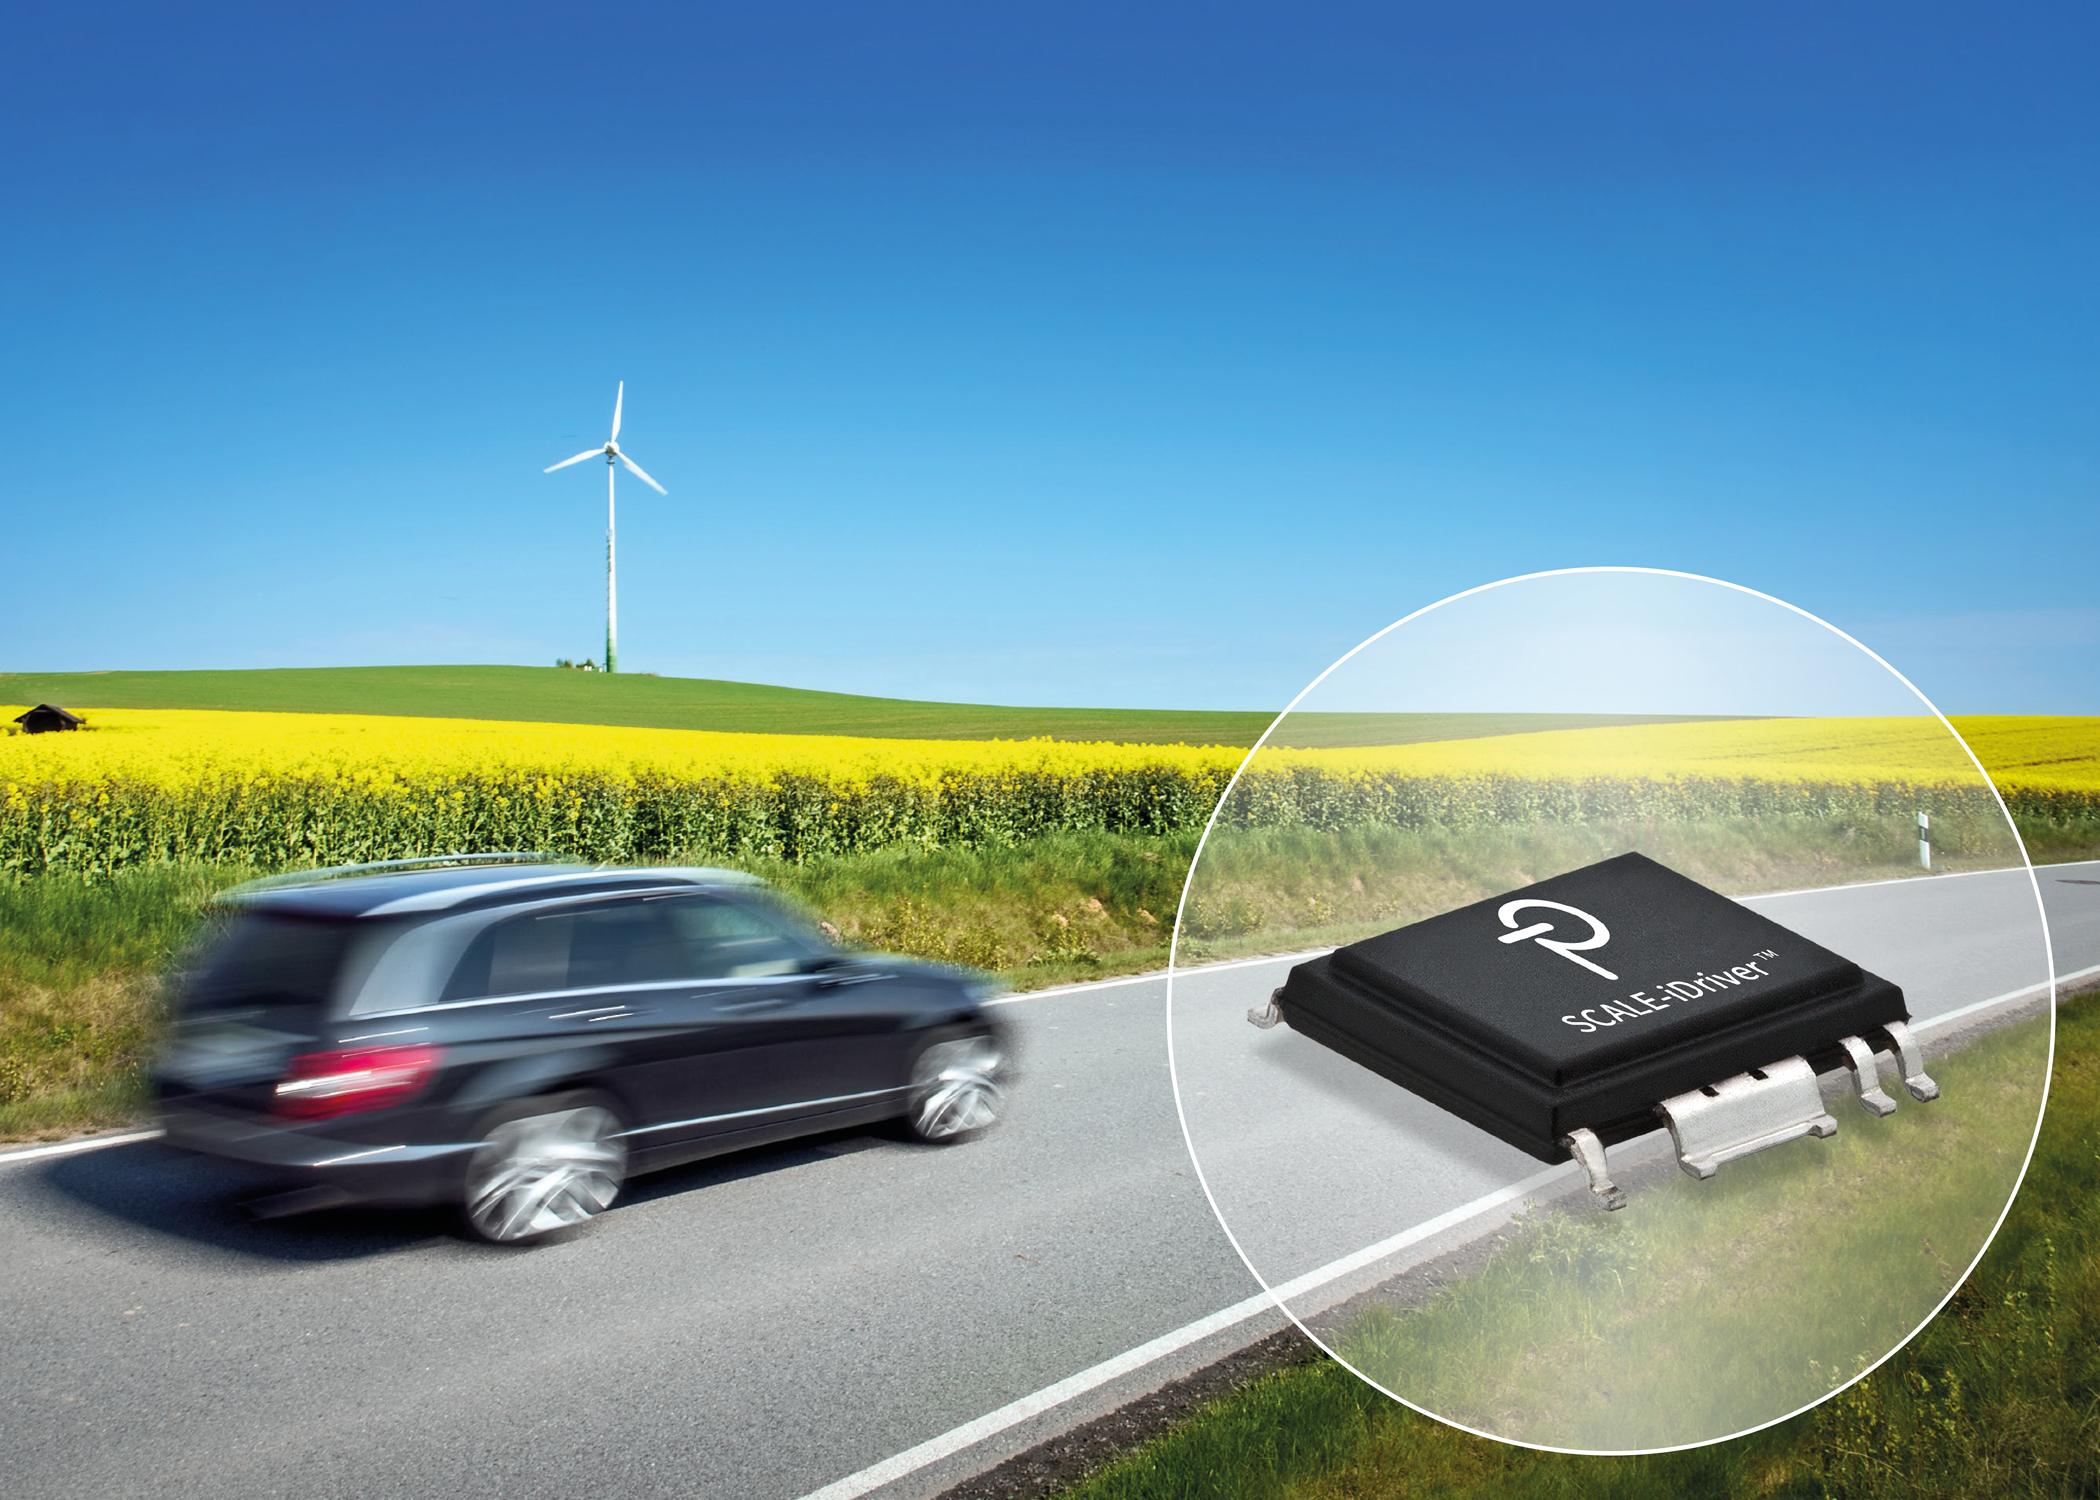 "Power Integrations门极驱动器产品高级市场总监Michael Hornkamp表示:""汽车厂商要求为纯电动汽车(EV)和混合动力电动汽车(HEV)应用提供安全、智能和高度集成的解决方案,包括主逆变器、制动斩波器、DC-DC电池变换器以及AC-DC车载电池充电器设计。 SCALE-iDriver门极驱动器产品系列通过AEC-Q100认证,使汽车设计工程师能够提高系统效率,并且首次从这种超级安全和可靠的绝缘技术中获得好处。我们的FluxLink磁耦合技术通过磁隔离进行数据传输,并且"